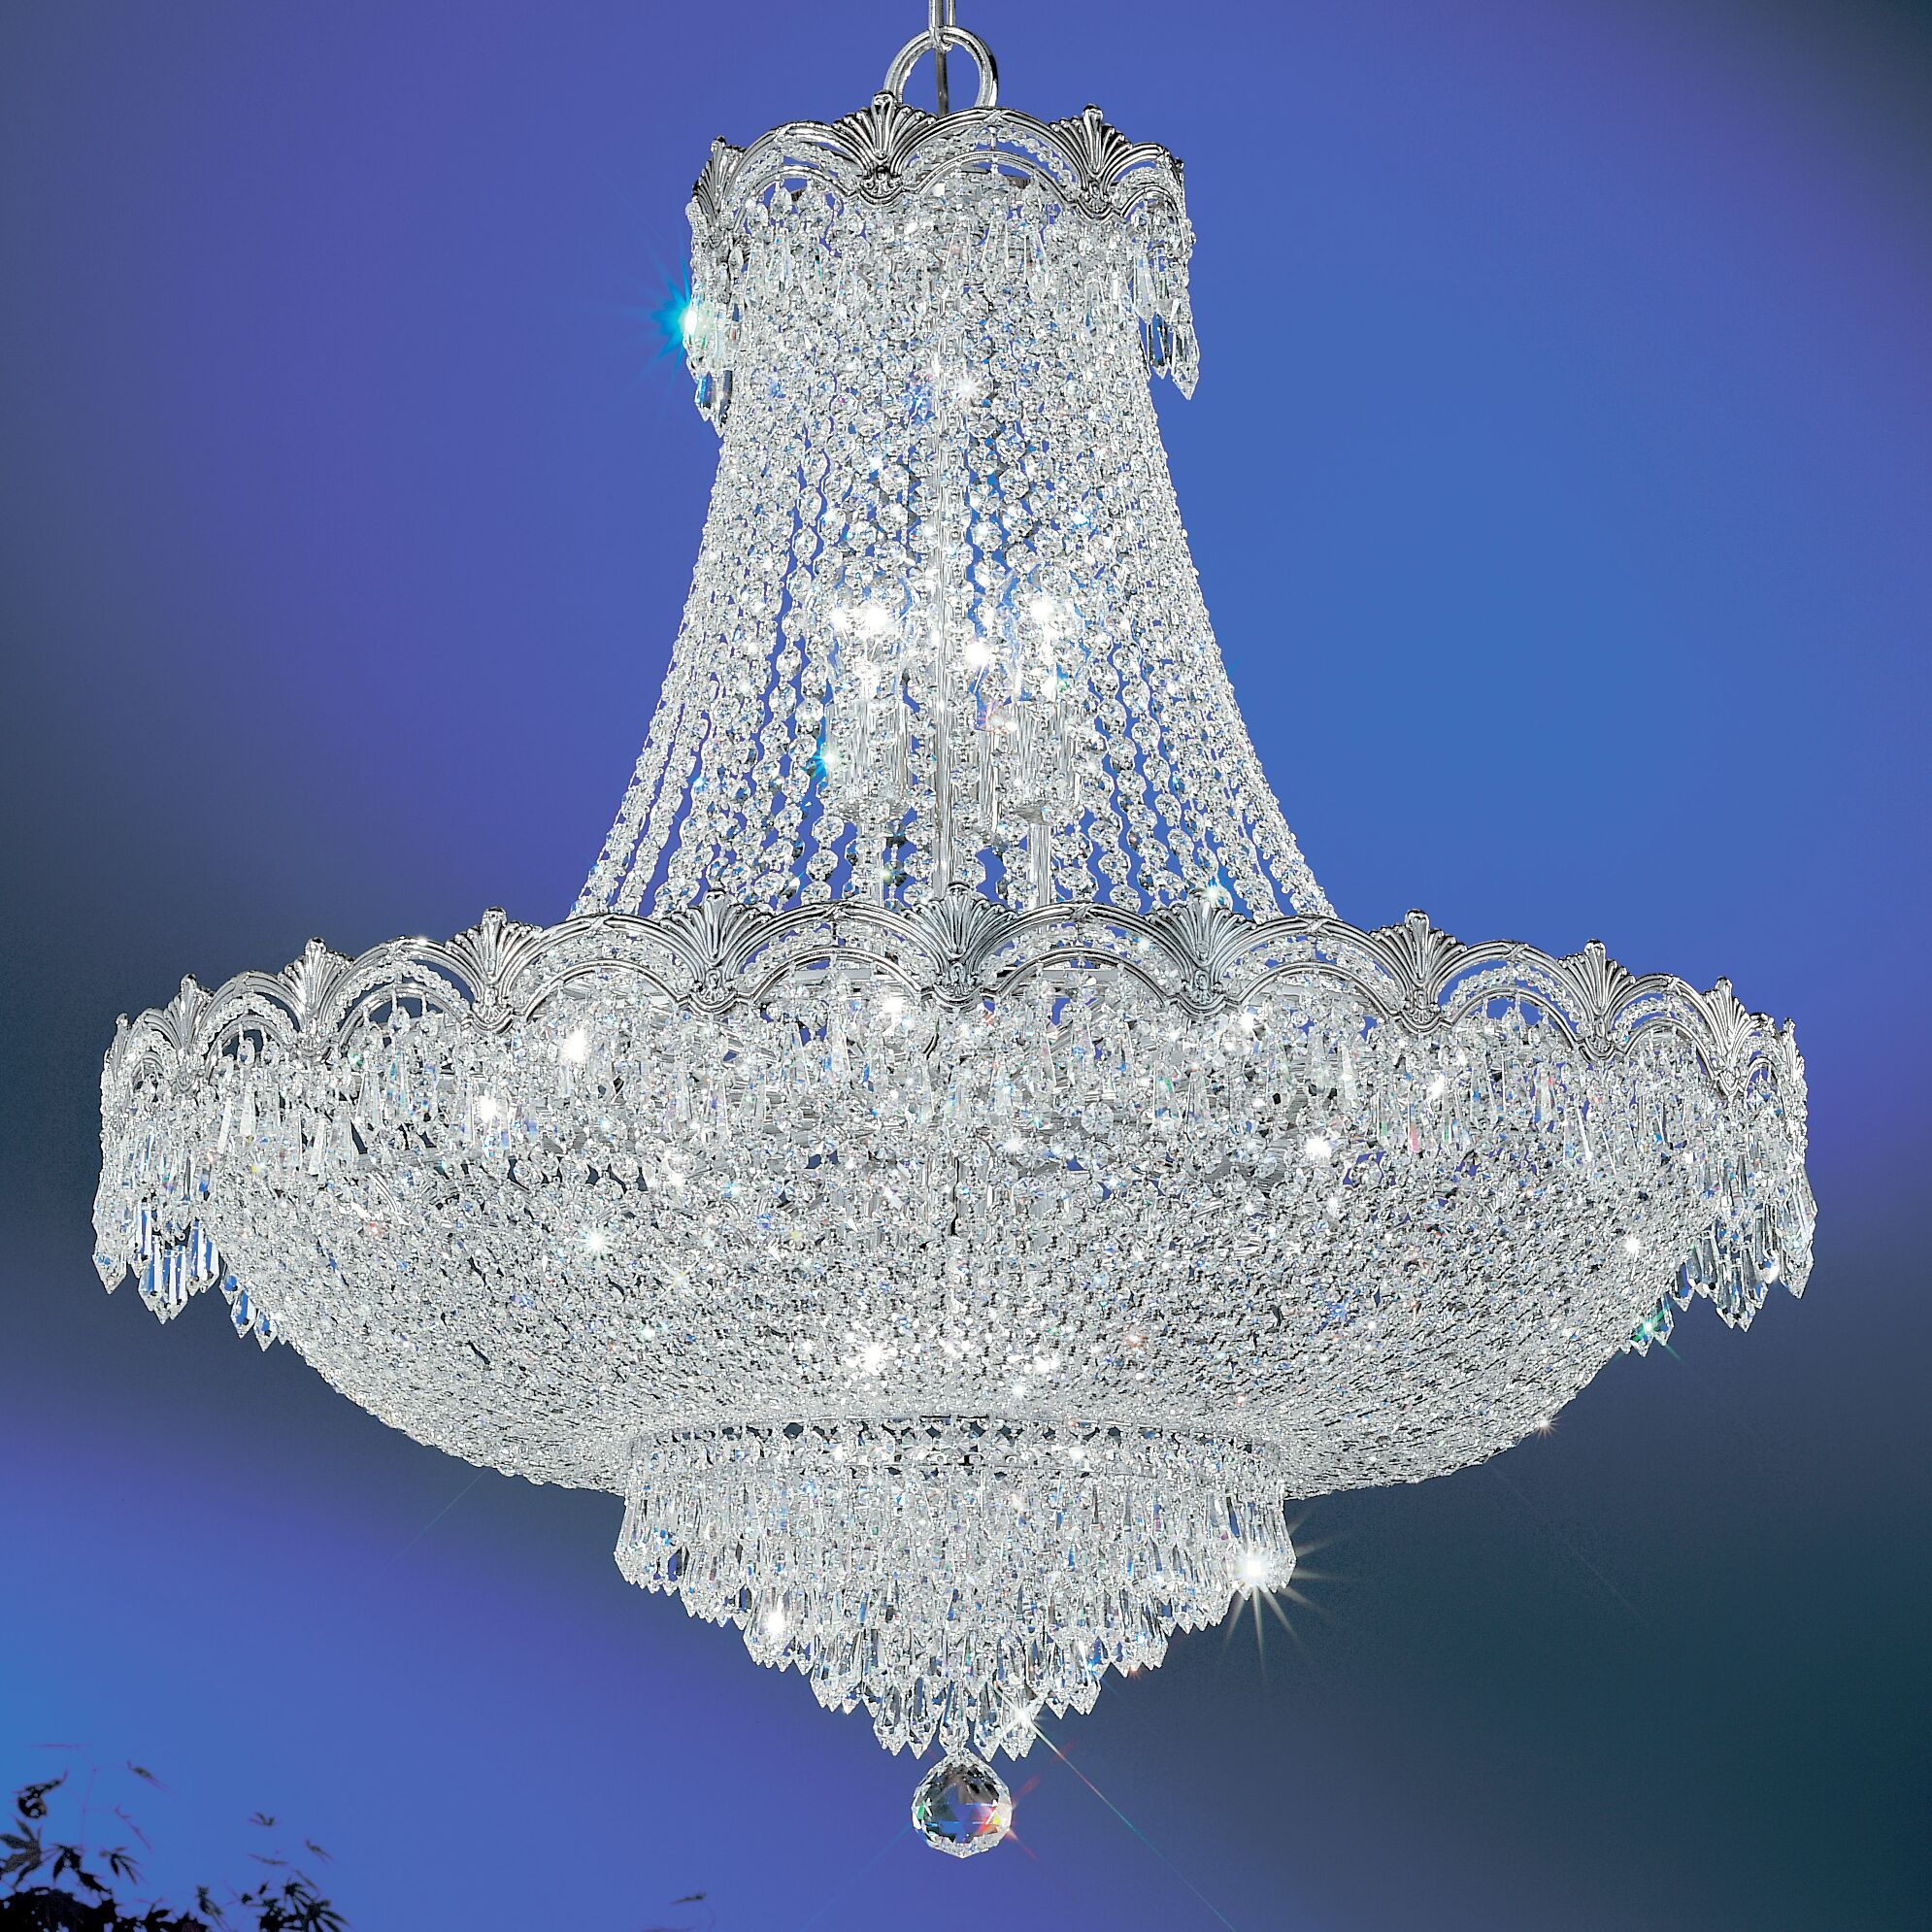 Regency II 11-Light Chandelier Finish: 24k Gold Plate, Crystal Type: Crystalique Golden Teak